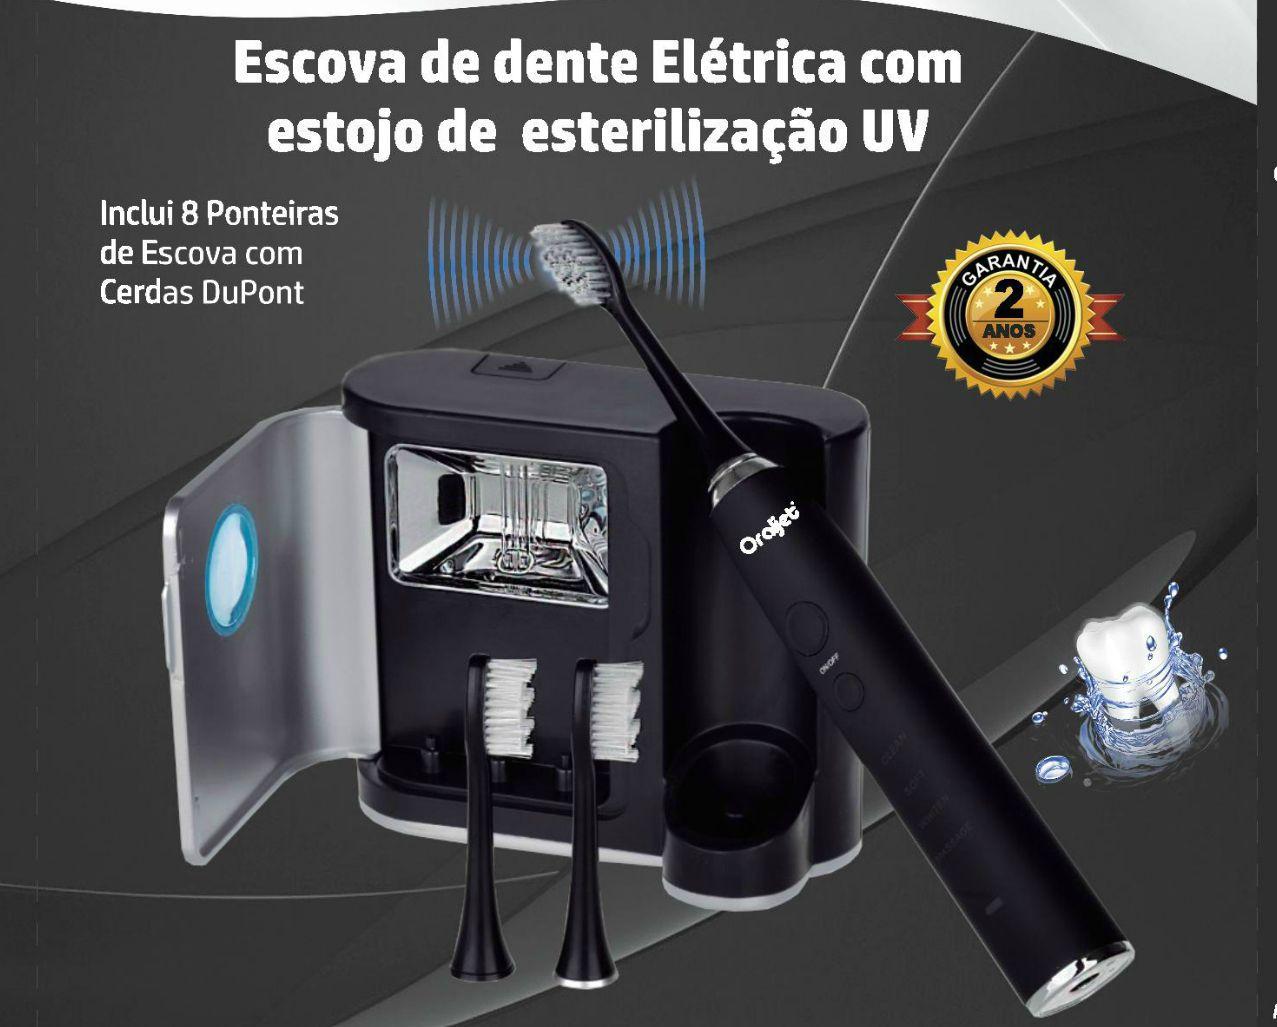 Oraljet Escova Dental Elétrica Ultrassônica SonicJet Profissional Alta Perfomance Ultra Família